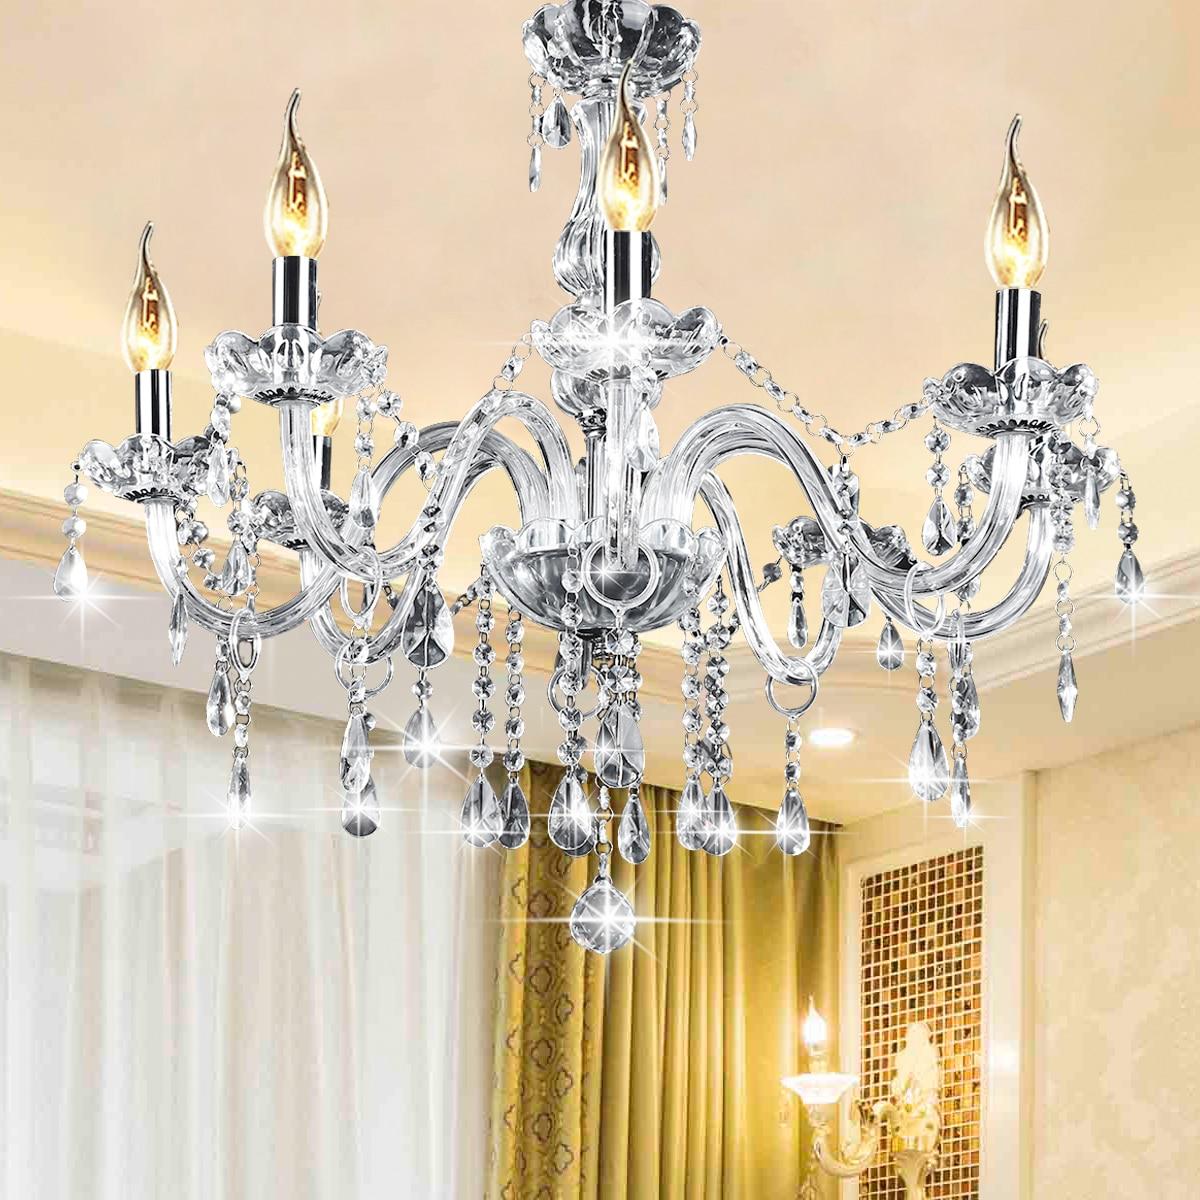 AC110-240V 8 Heads E12 Clear Crystal Chandelier Ceiling Light Modern Chandeliers Crystal Light Fixture Bedroom Hanging цена